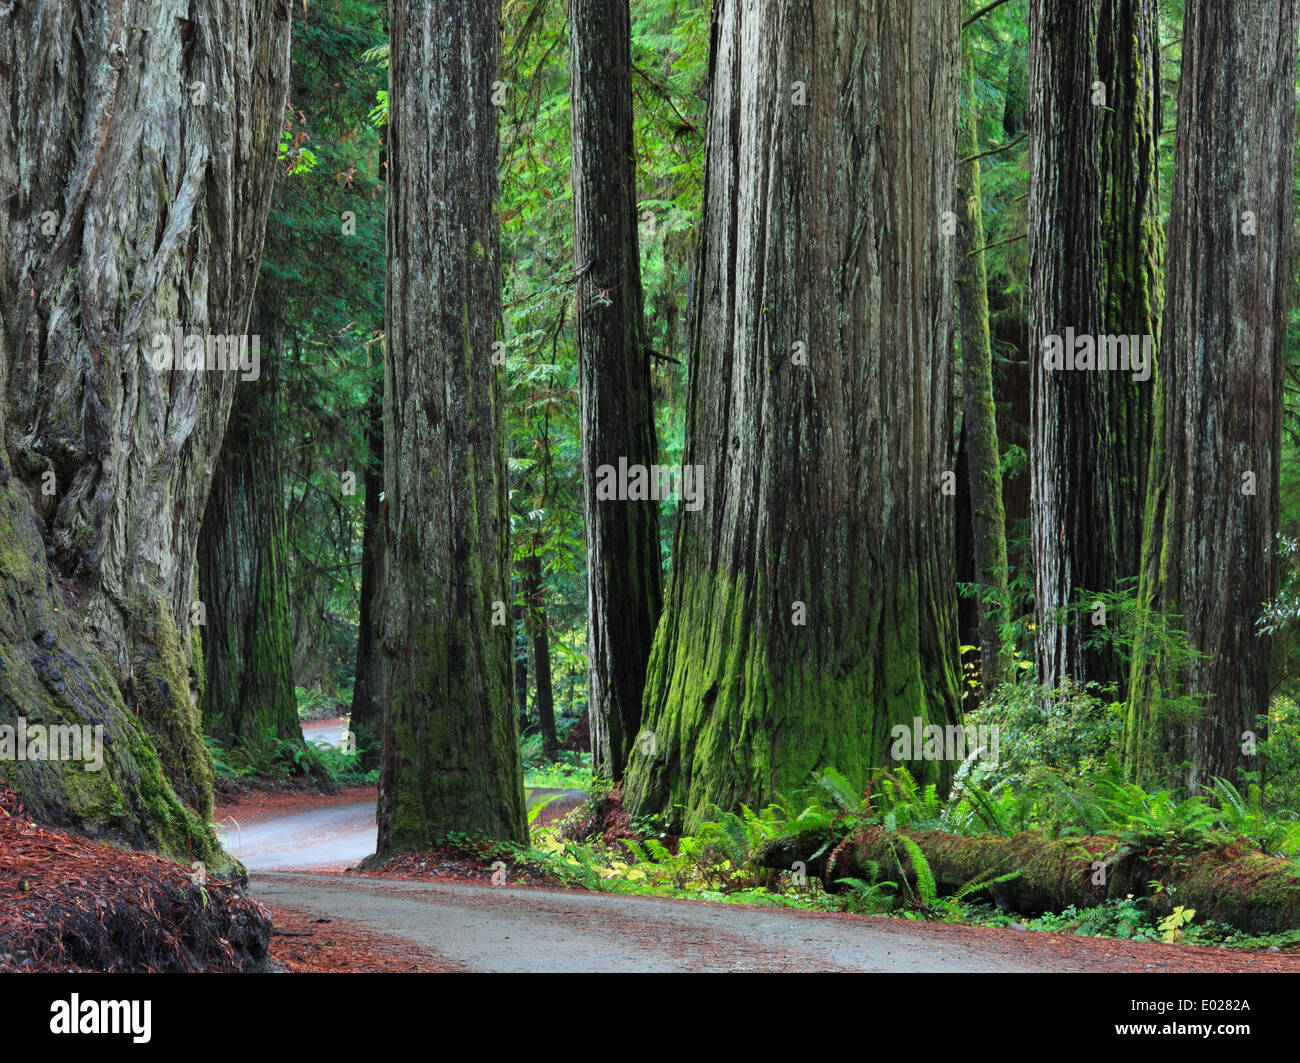 Photo of Jedediah Smith Redwoods State Park, California - Stock Image